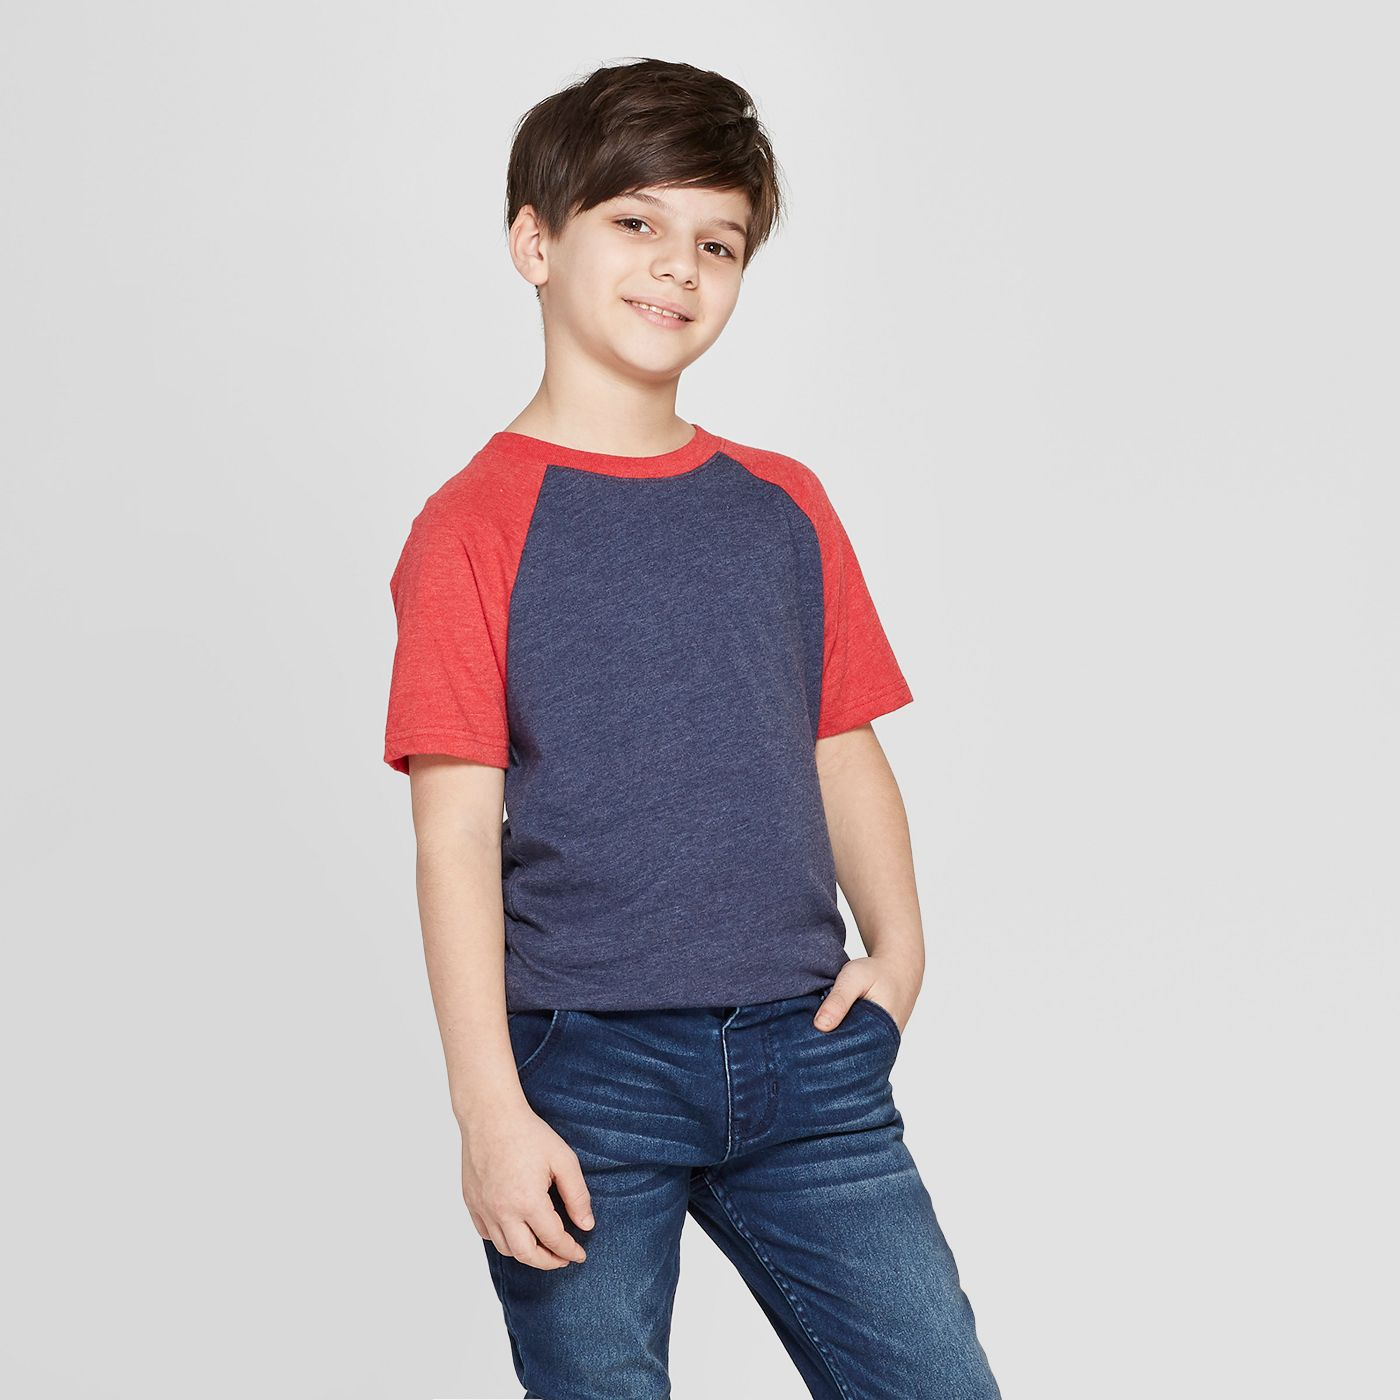 Boys' Baseball Short Sleeve T-Shirt - Cat & Jack™ Blue/Red - image 1 of 3